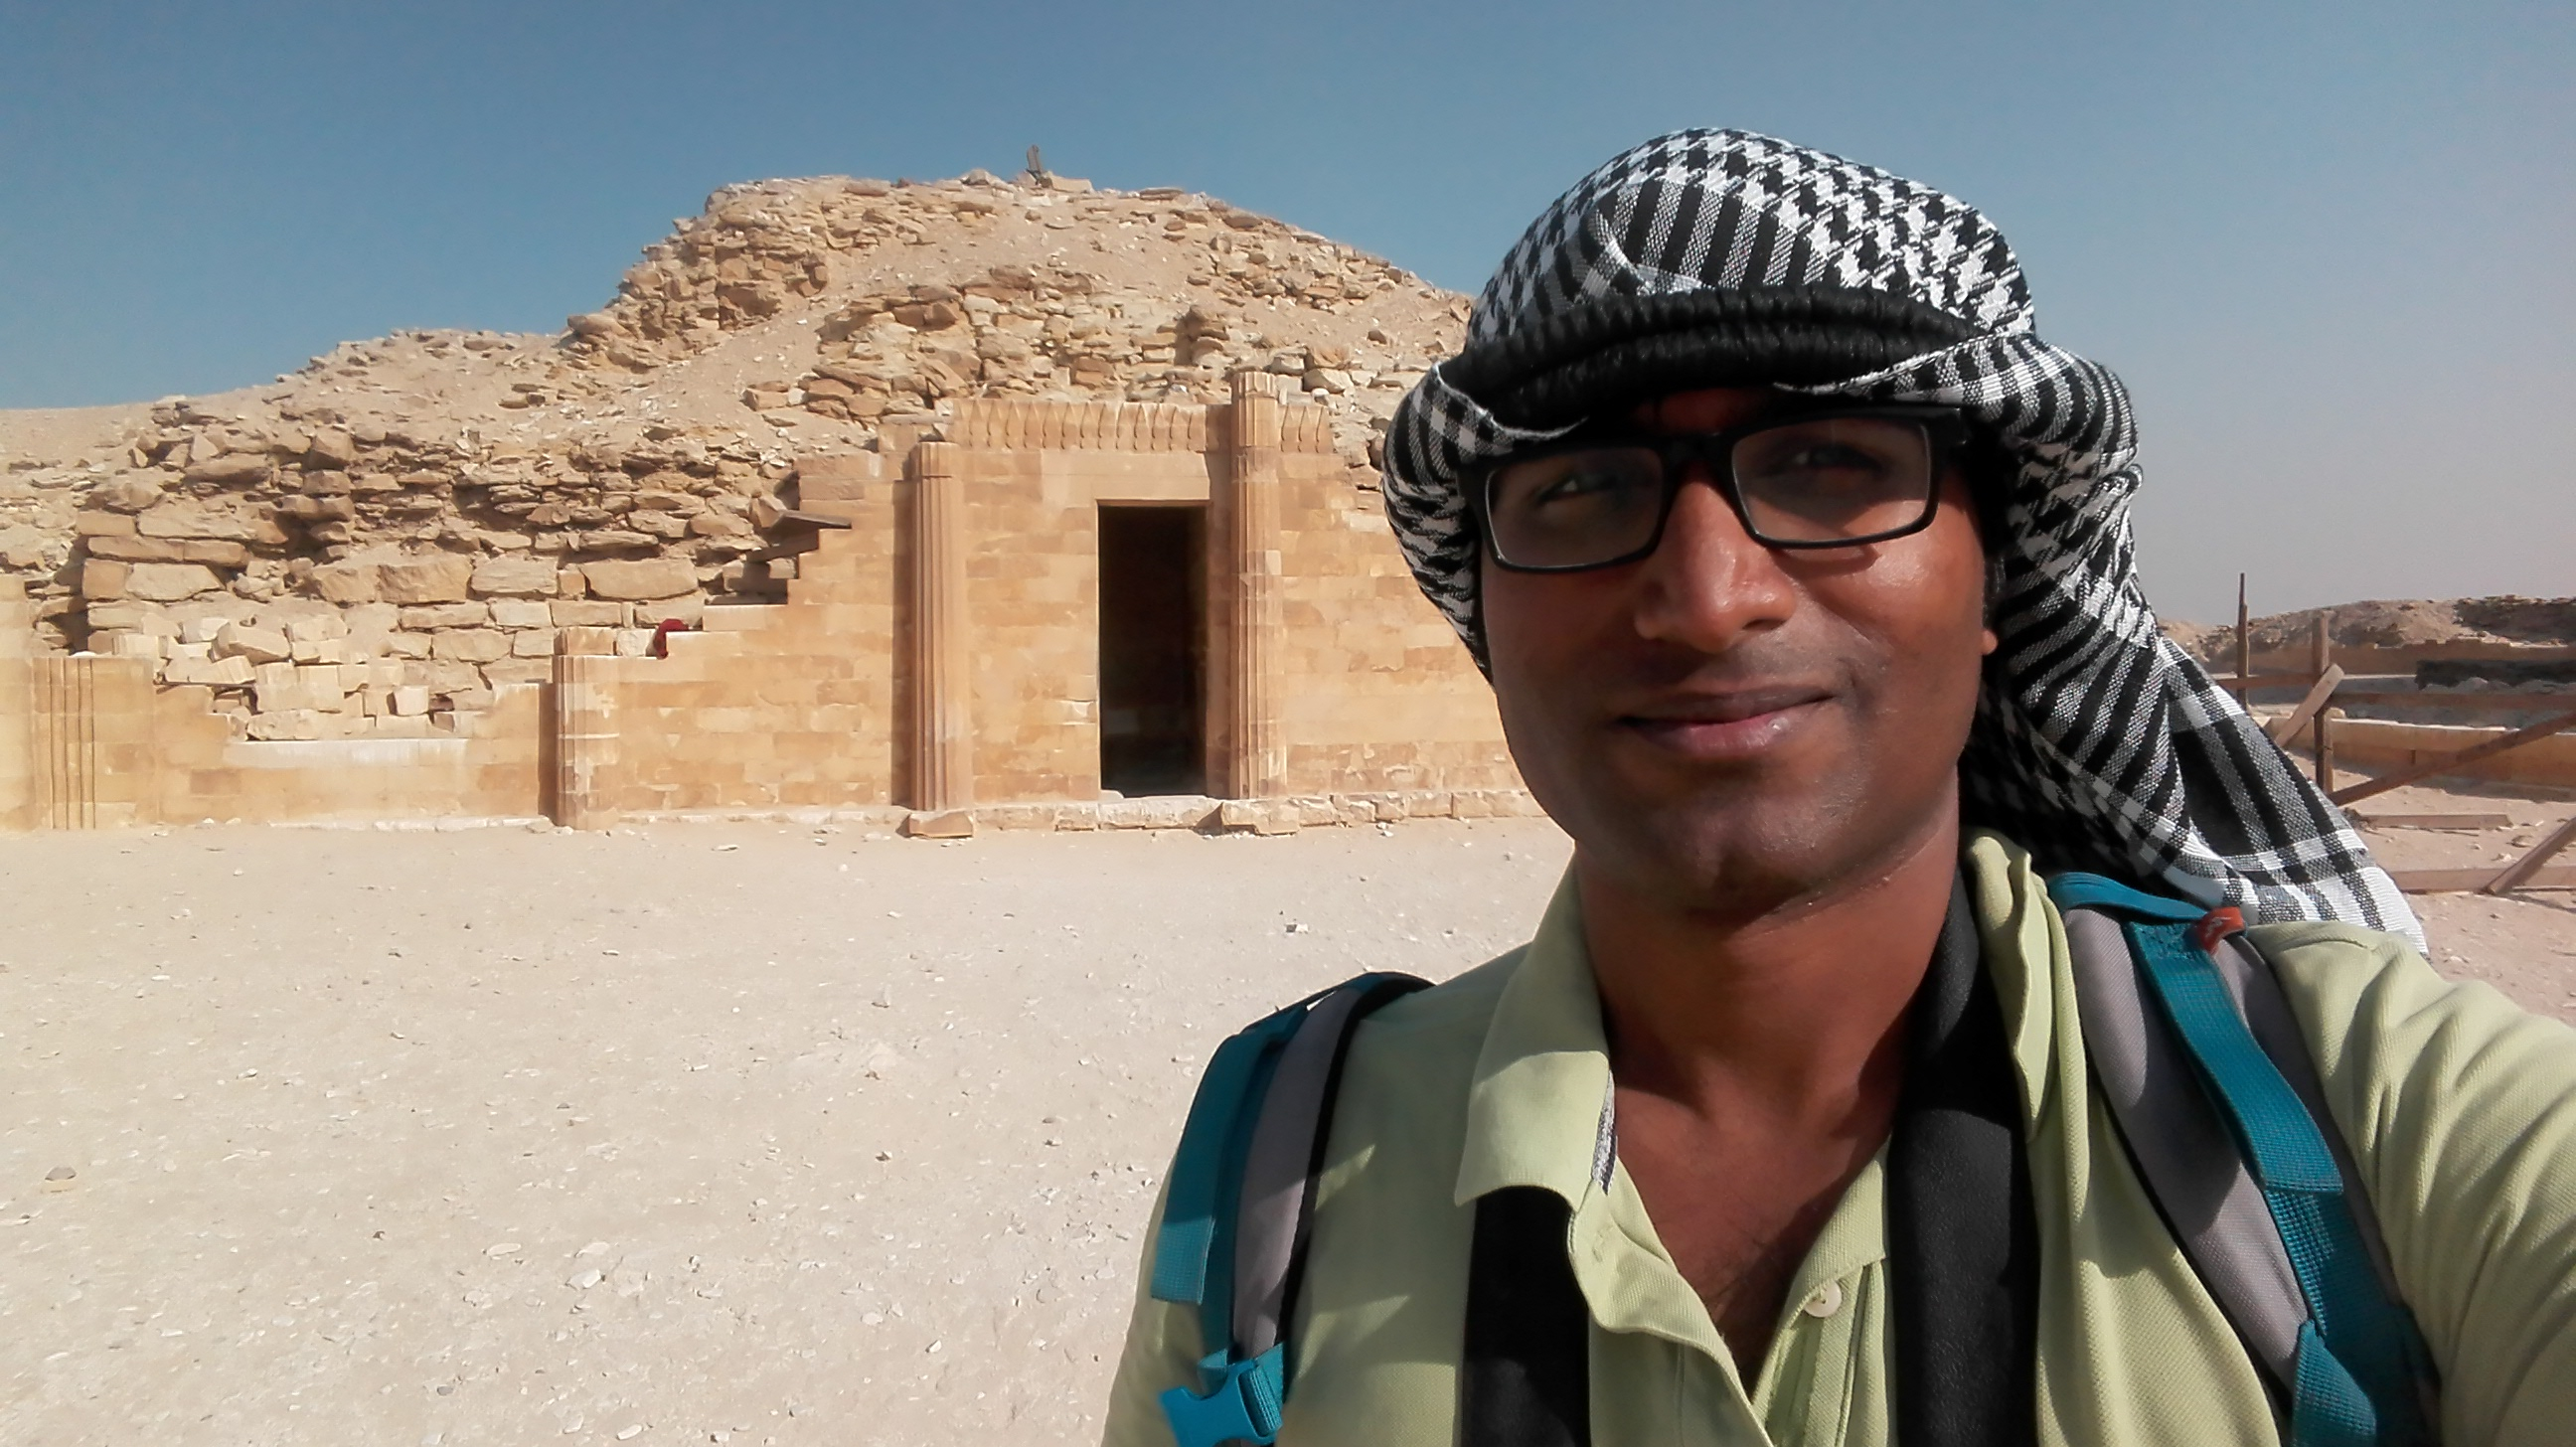 Mohammad Abu Al Hasan